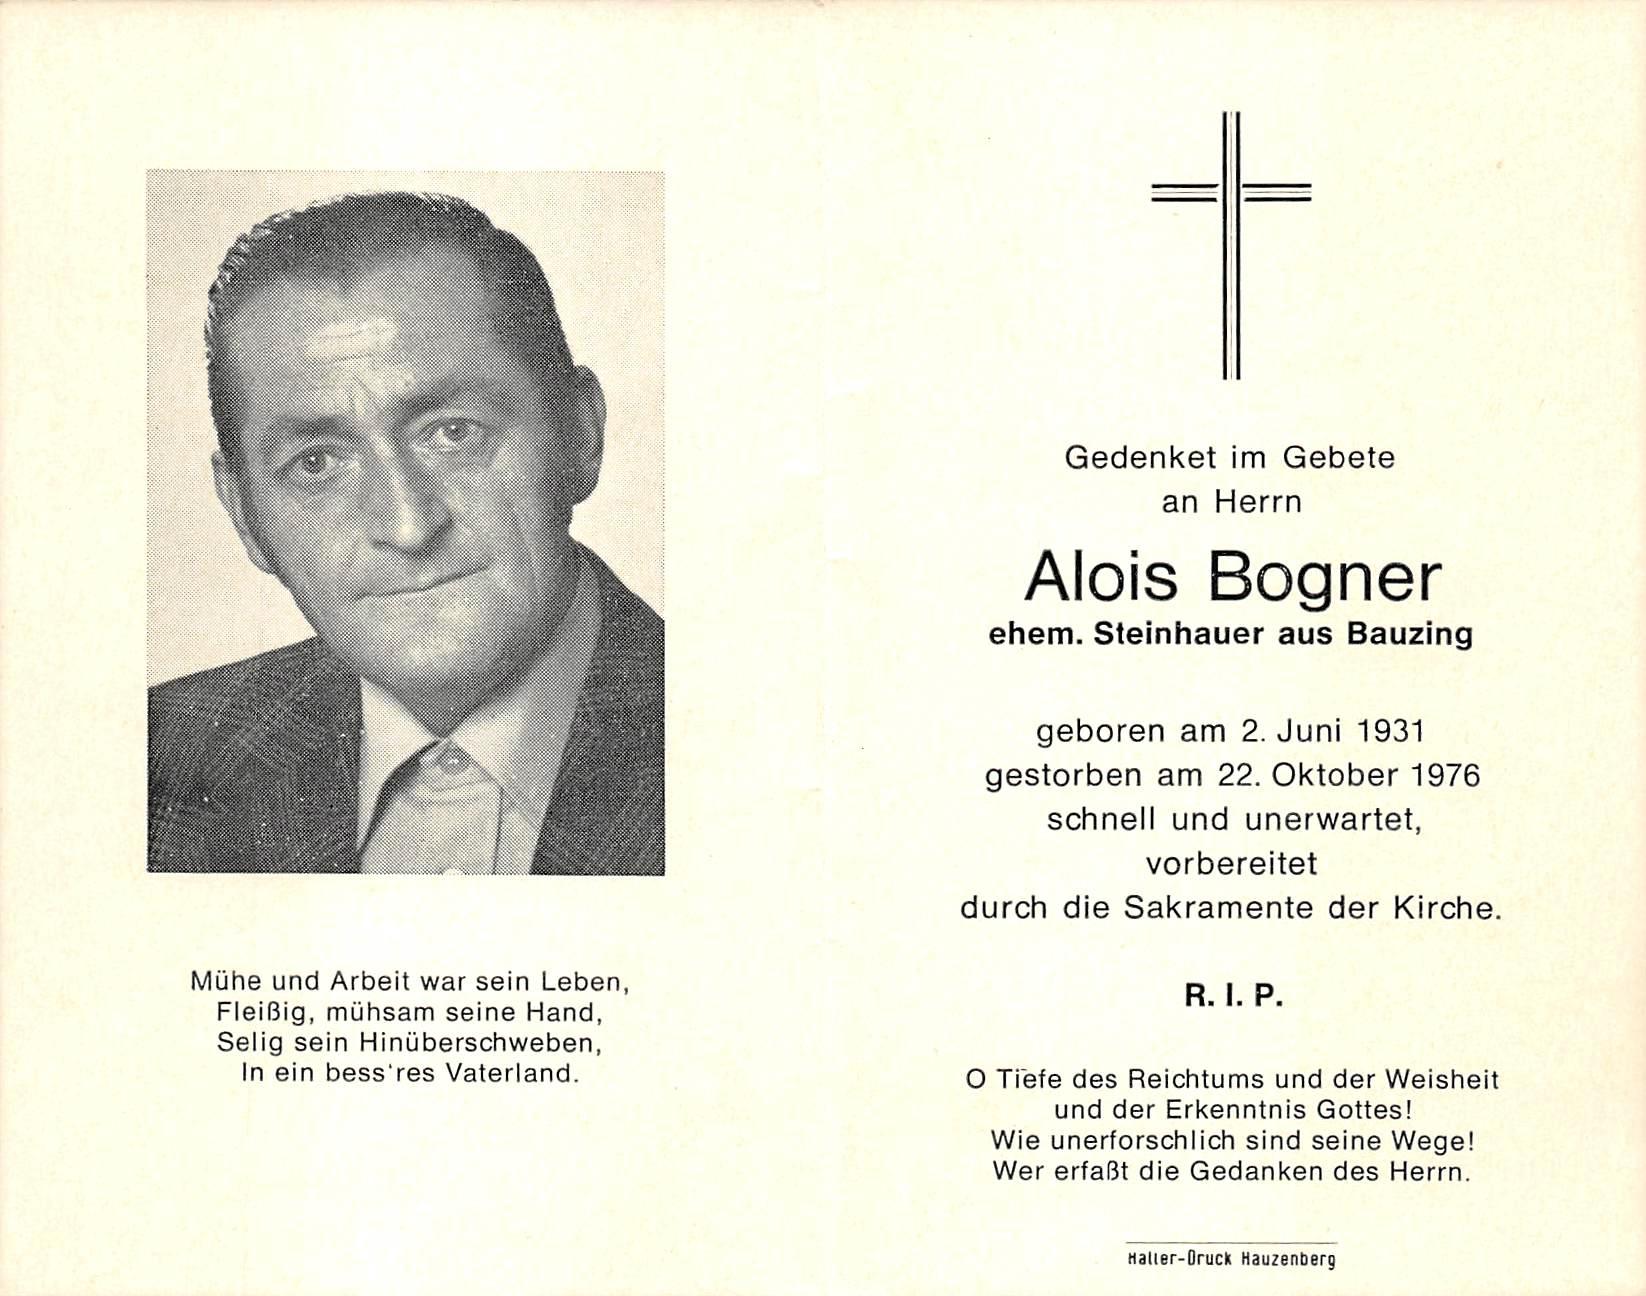 1976-10-22-Bogner-Alois-Bauzing-ehem.-Steinhauer